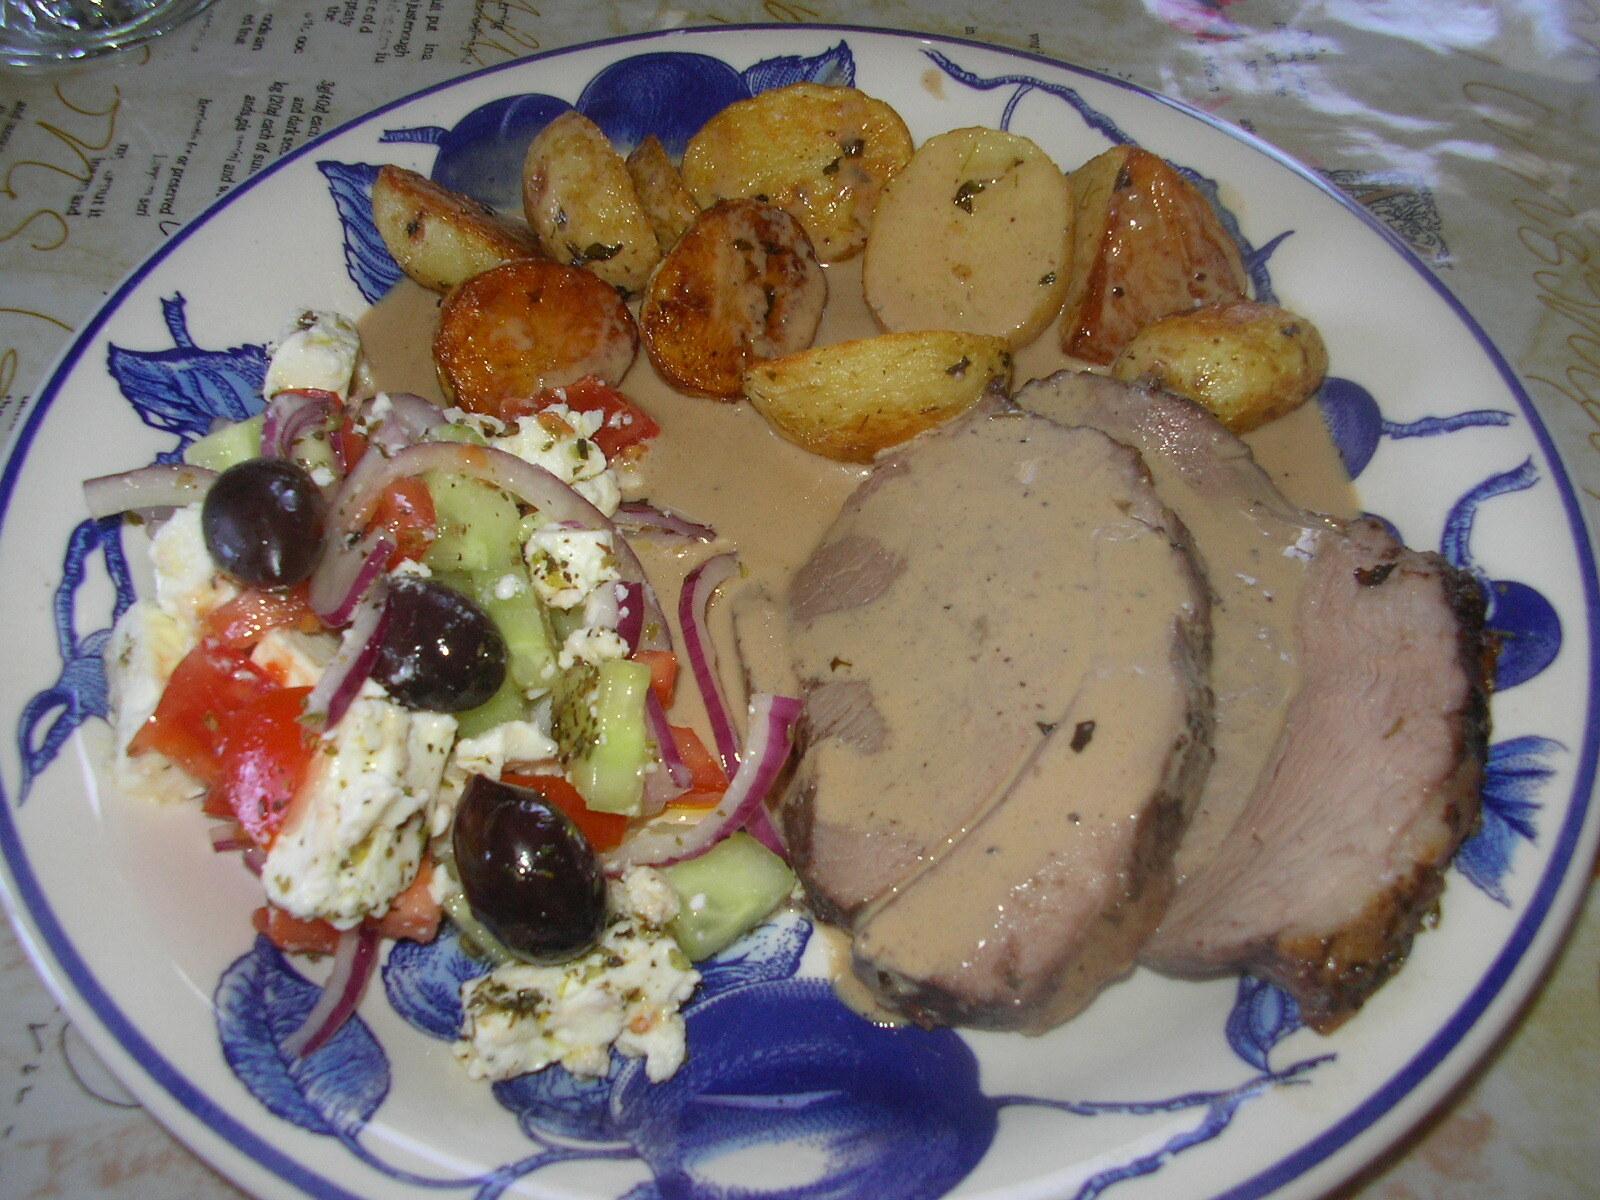 varm grekisk sallad i ugnen